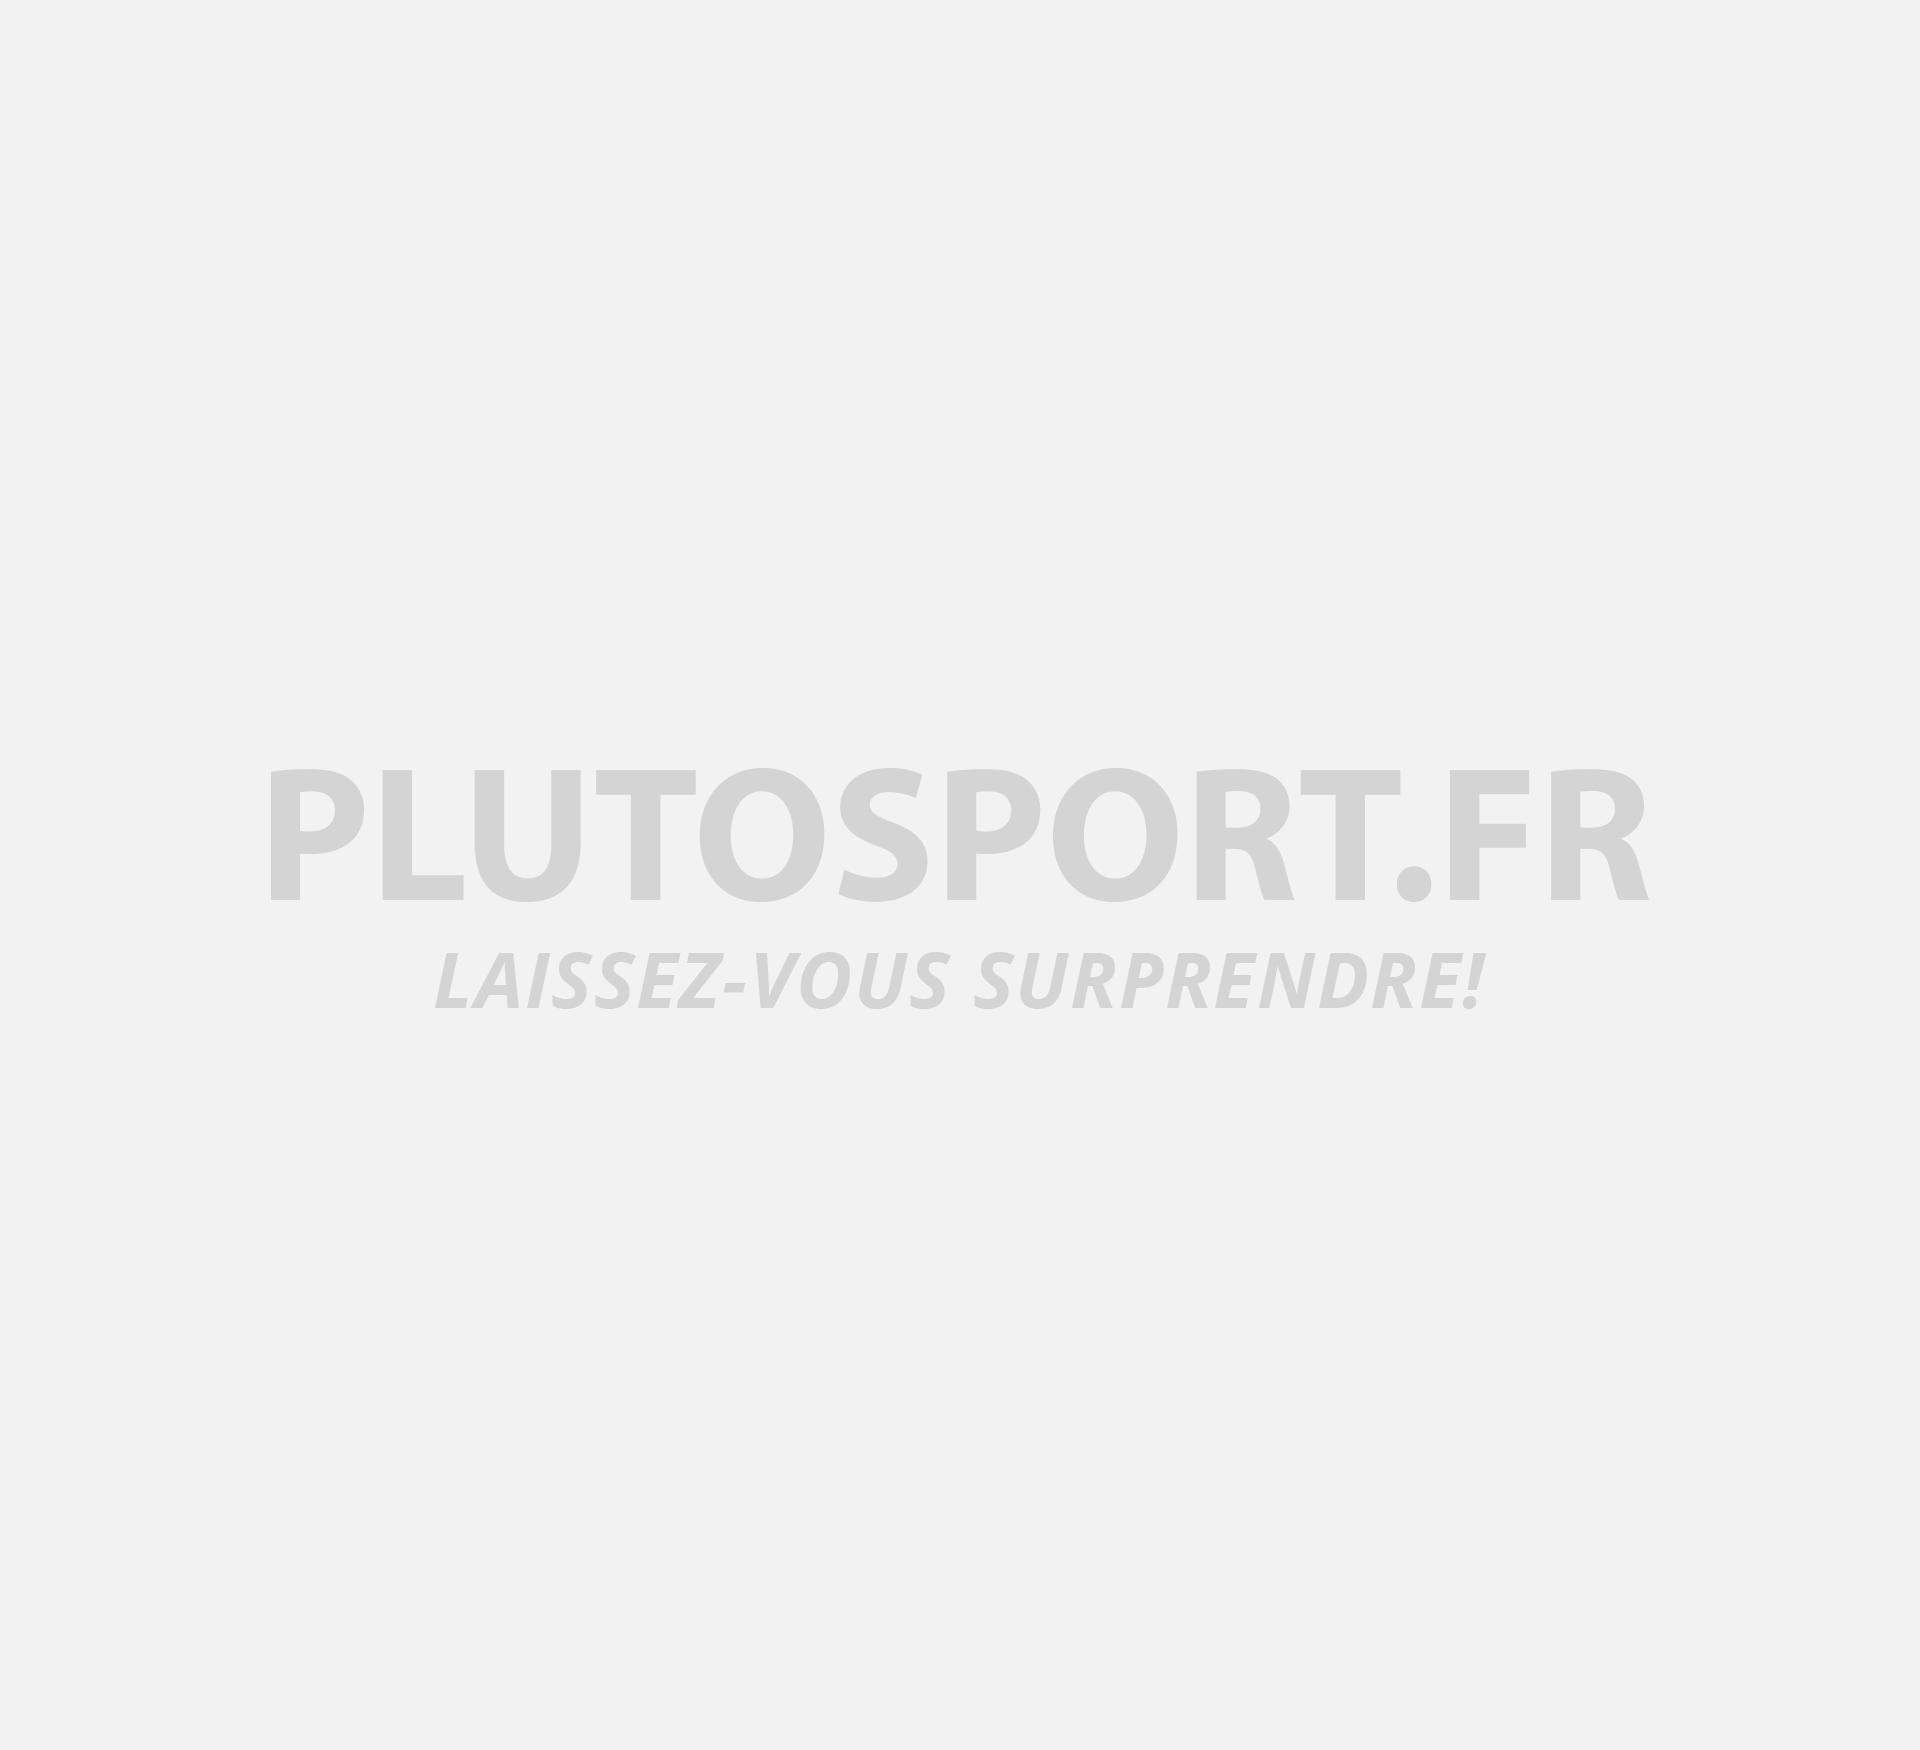 Nike Hypervenom Phelon III AG-Pro, Chaussures de Football pour hommes